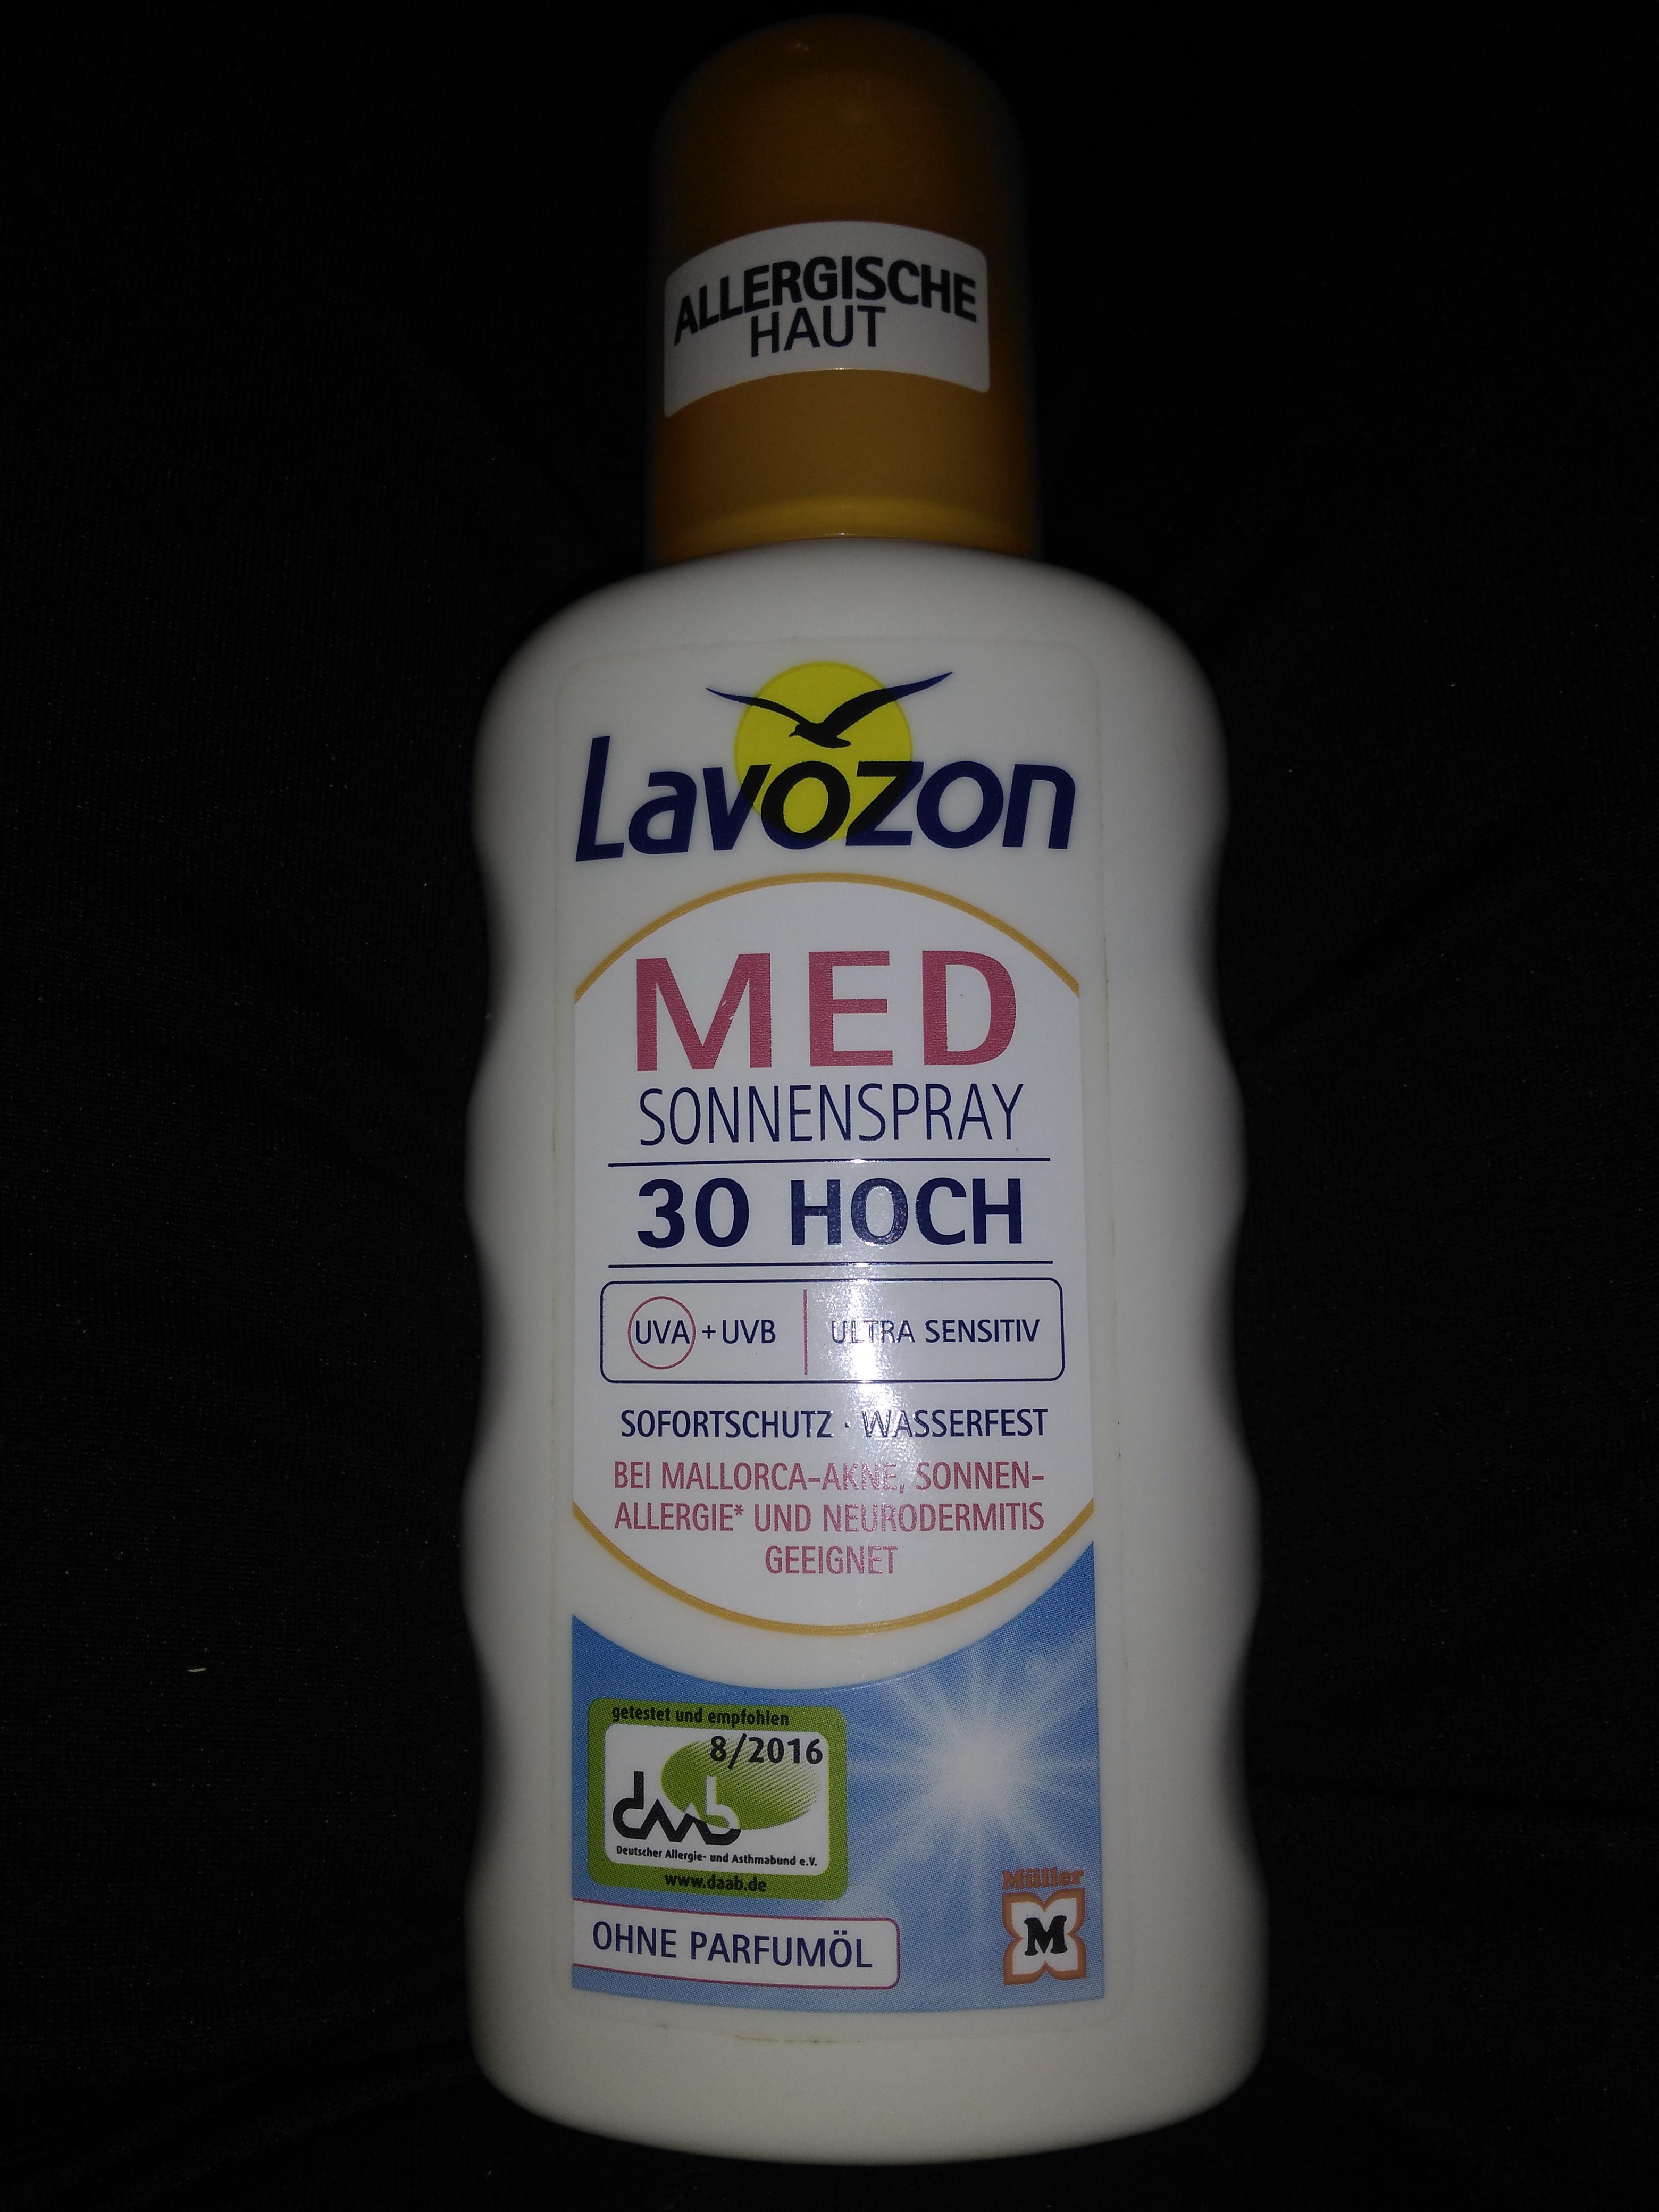 Lavozon Med Sonnenspray 30 Ultrasensitive